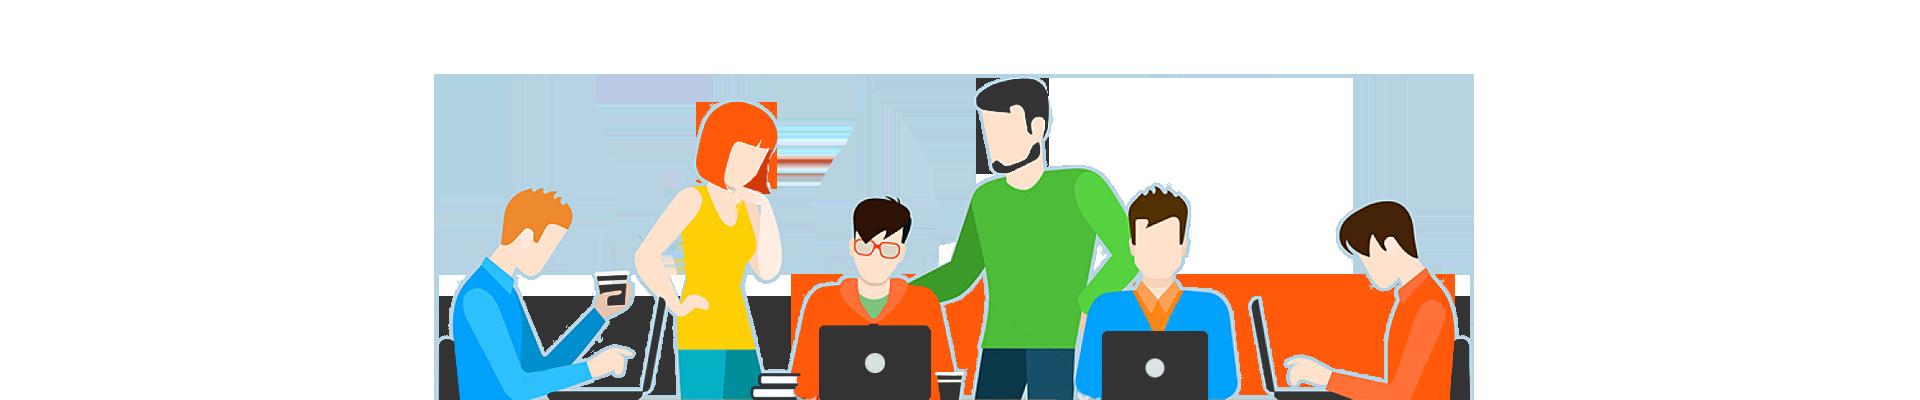 web-agency-team-work-1